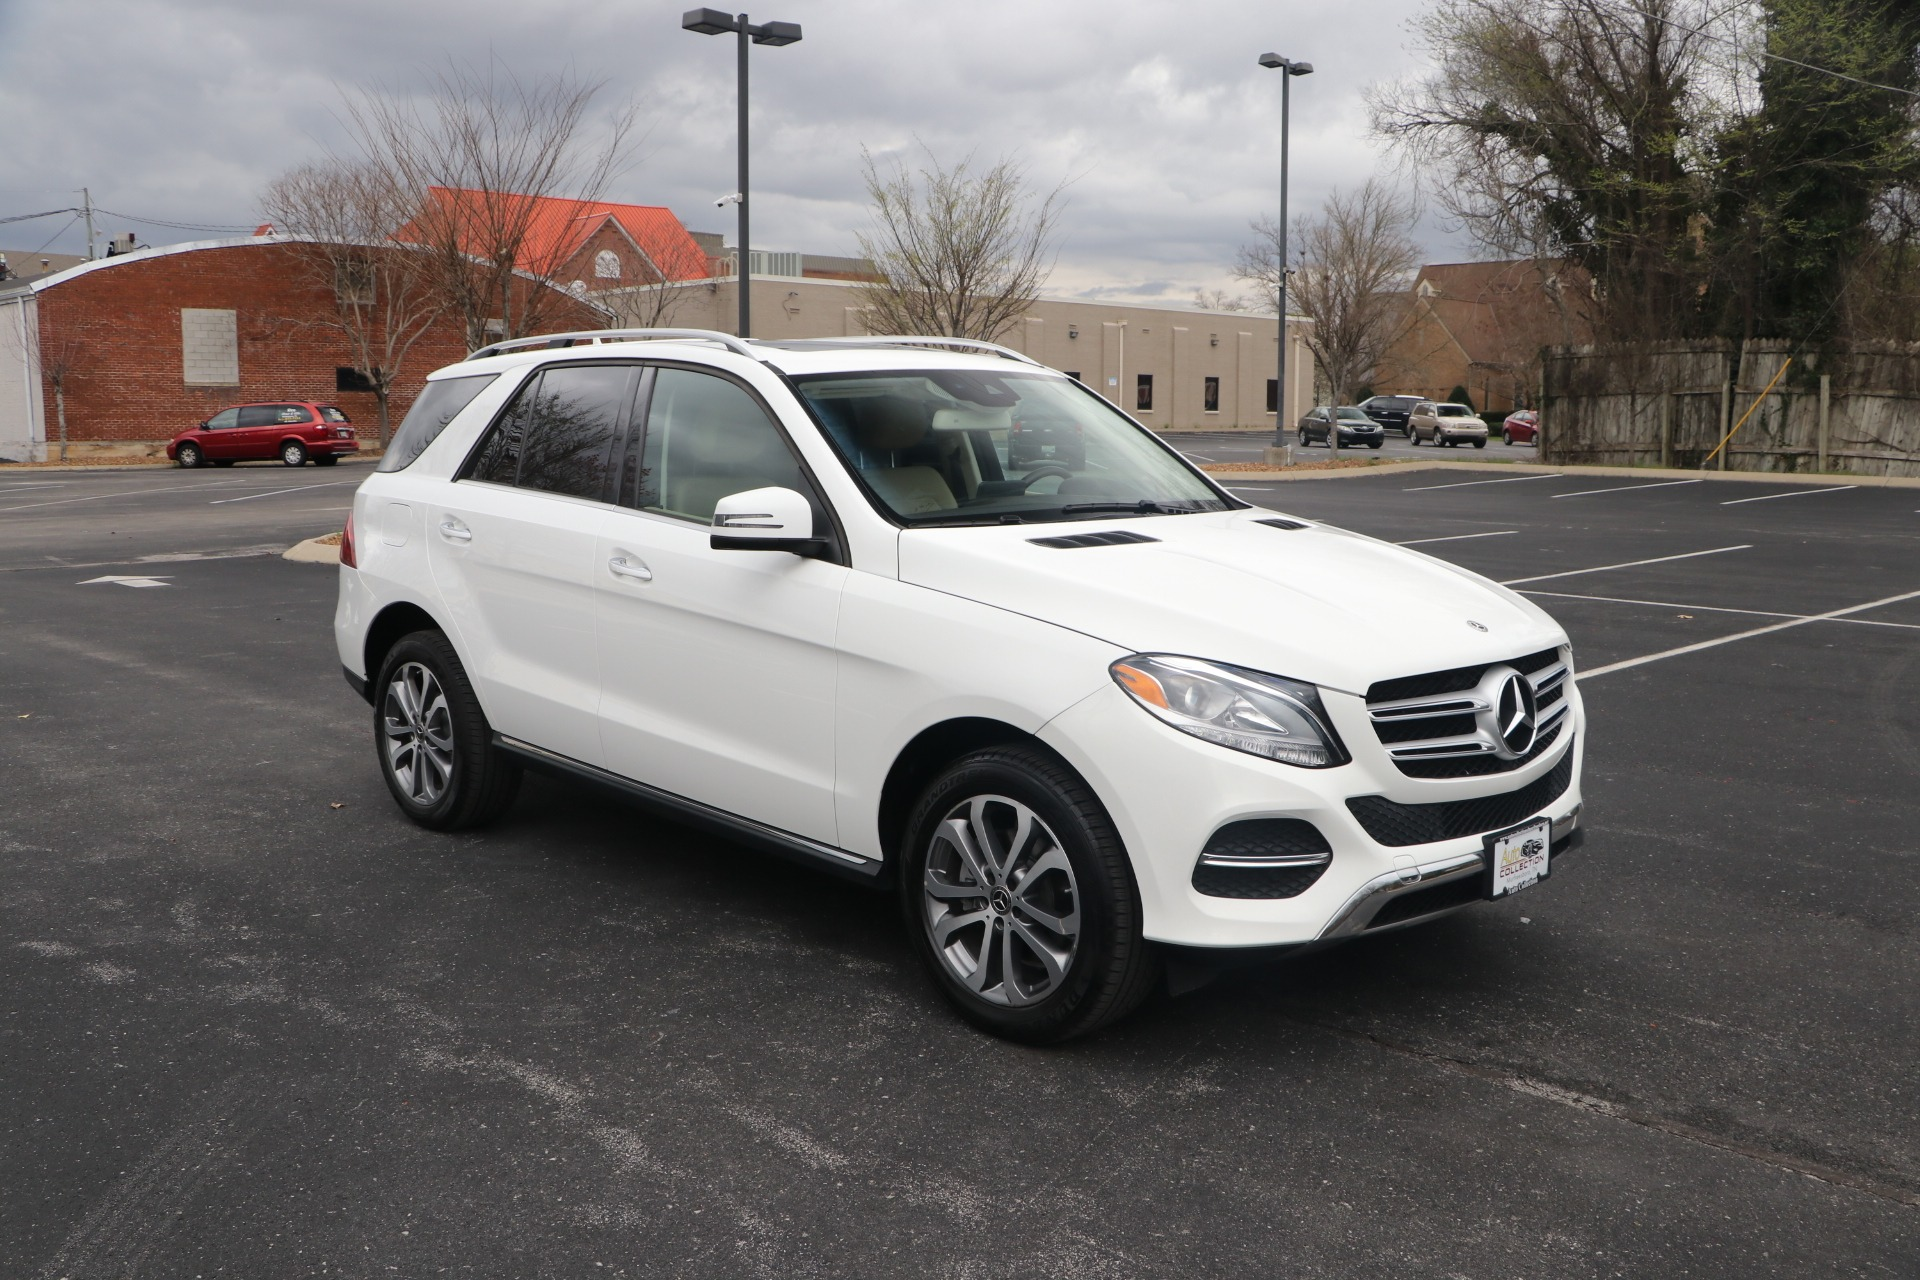 Used 2018 Mercedes-Benz GLE 350 PREMIUM 4MATIC W/NAV for sale Sold at Auto Collection in Murfreesboro TN 37130 1